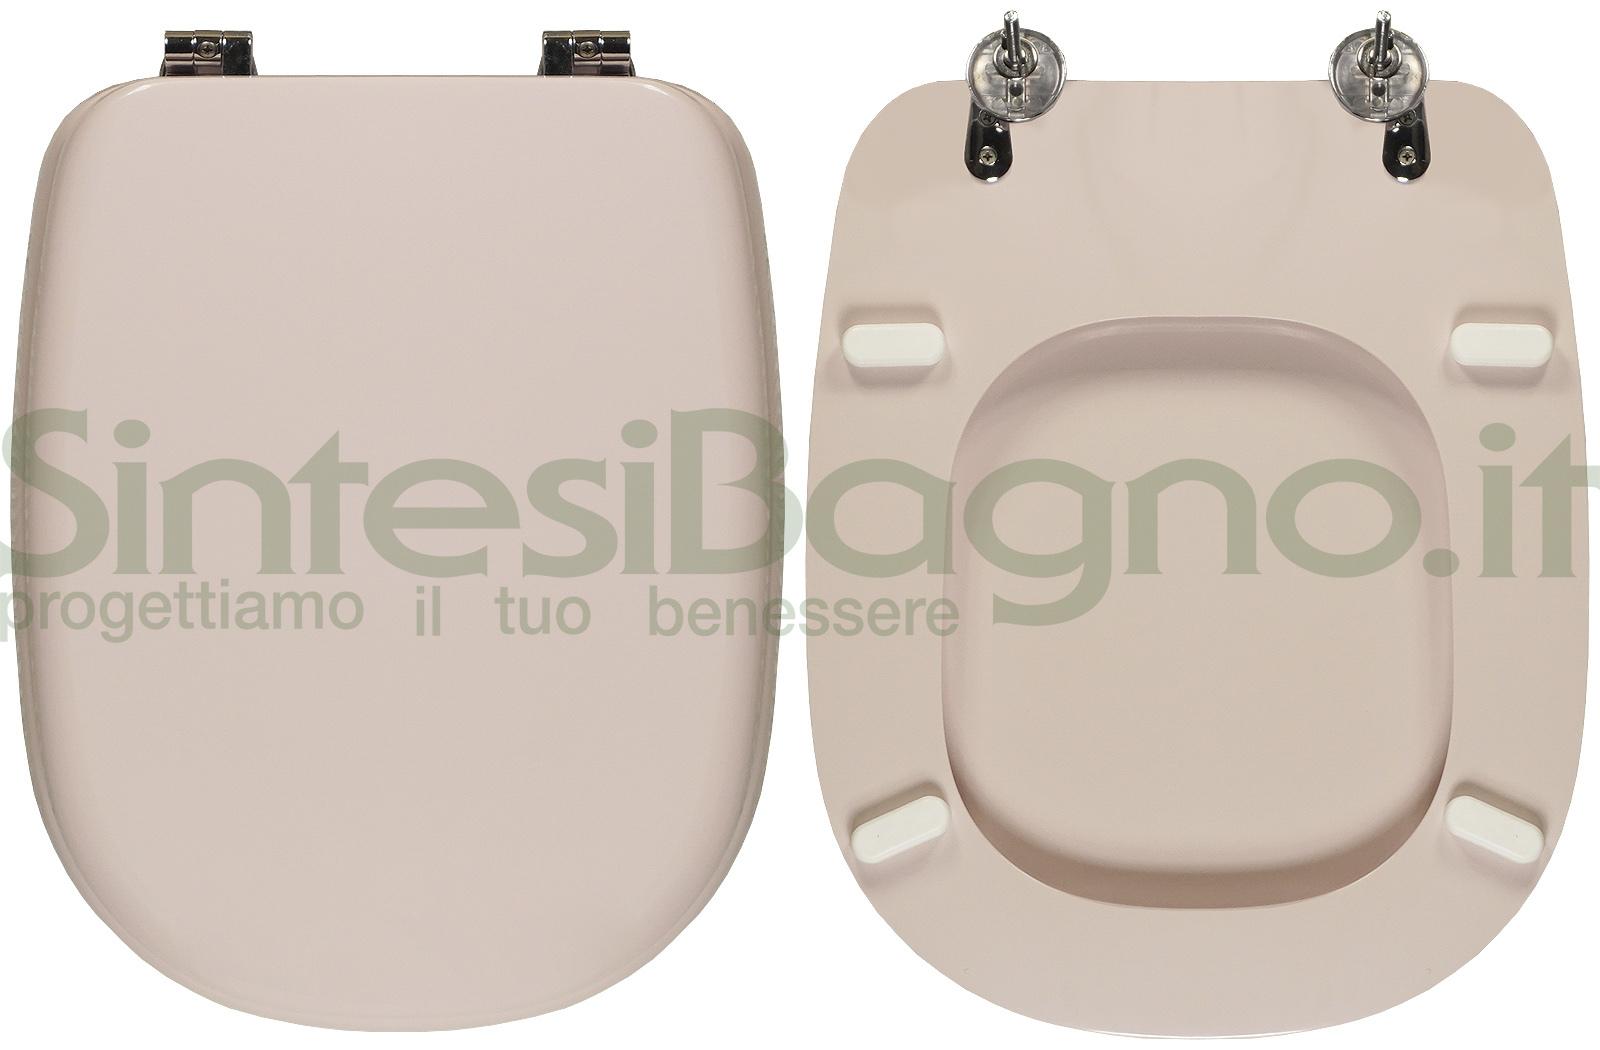 Sedile Tesi Ideal Standard Bianco Europa.Copriwater Per Wc Tesi Ideal Standard Rosa Sussurrato Ricambio Dedicato Sintesibagno Shop Online